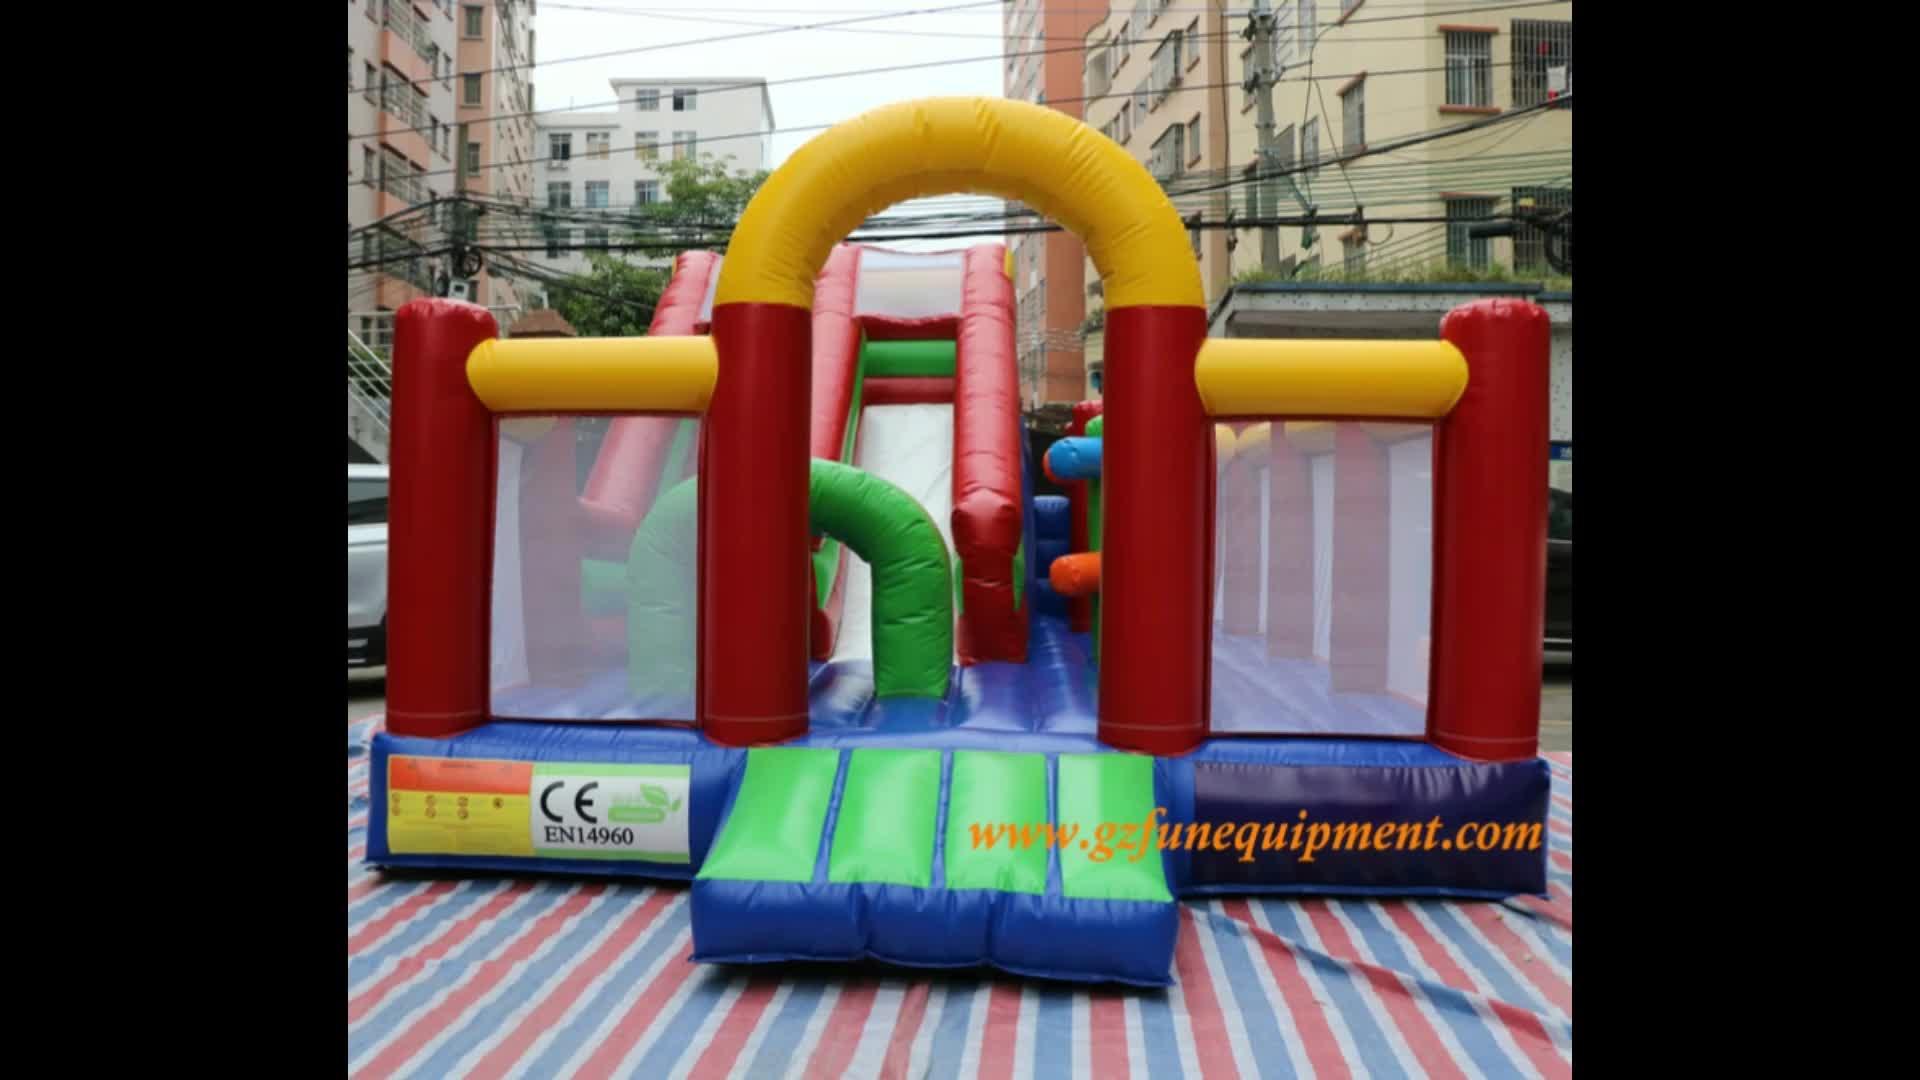 Hot sale inflatable bounce castle bouncy slide inflatable jumping bouncer for Amusement park